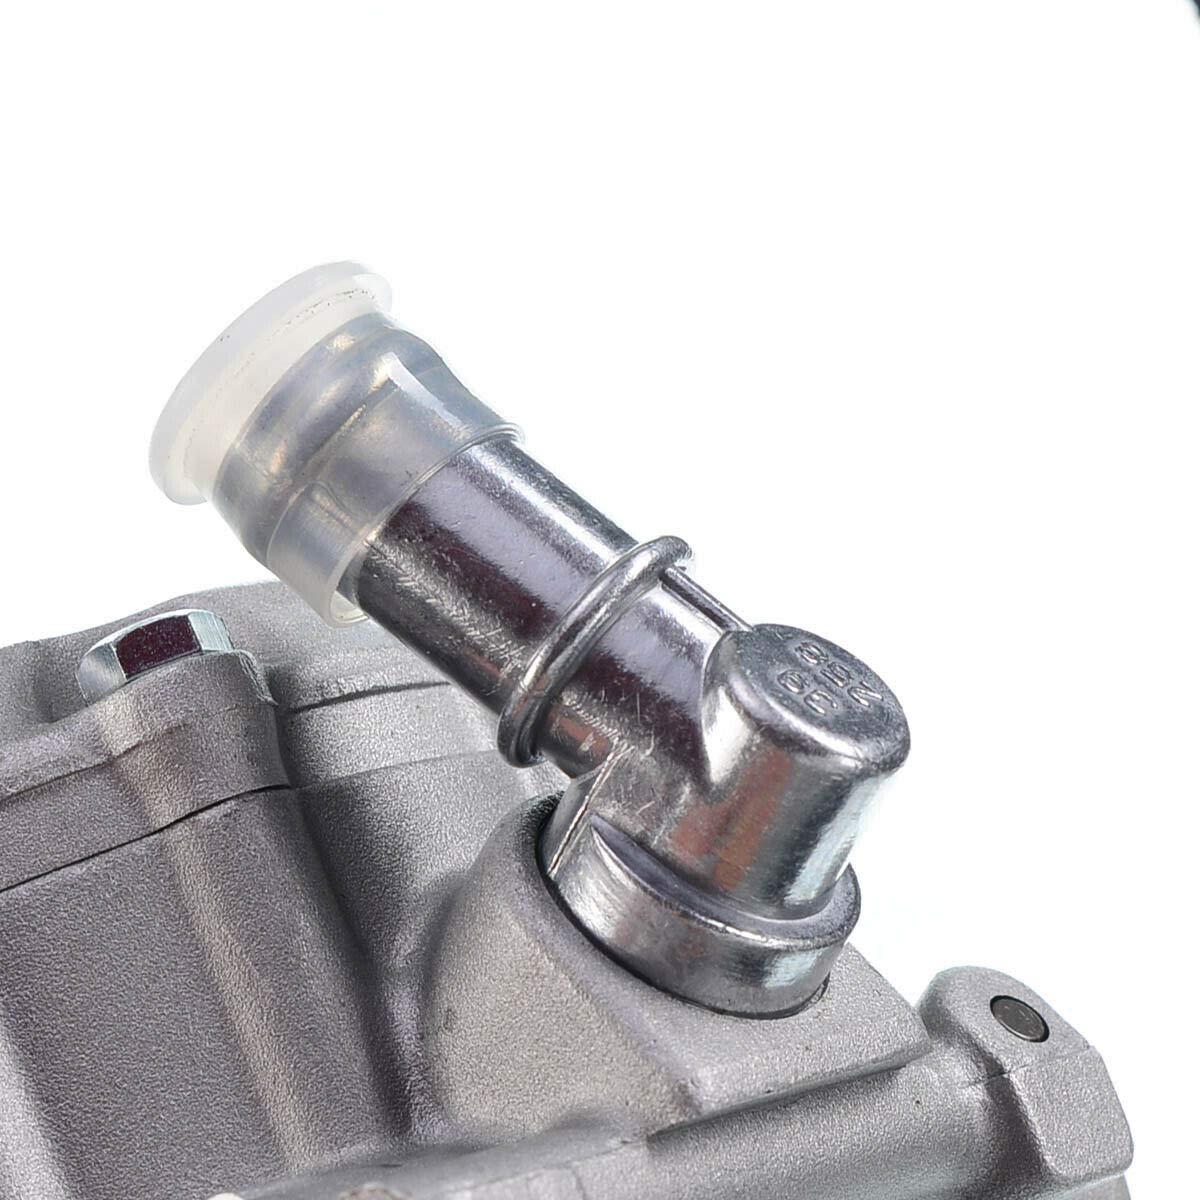 Power Steering Pump for BMW 545i 645Ci 2005 525i 530i 2004-2005